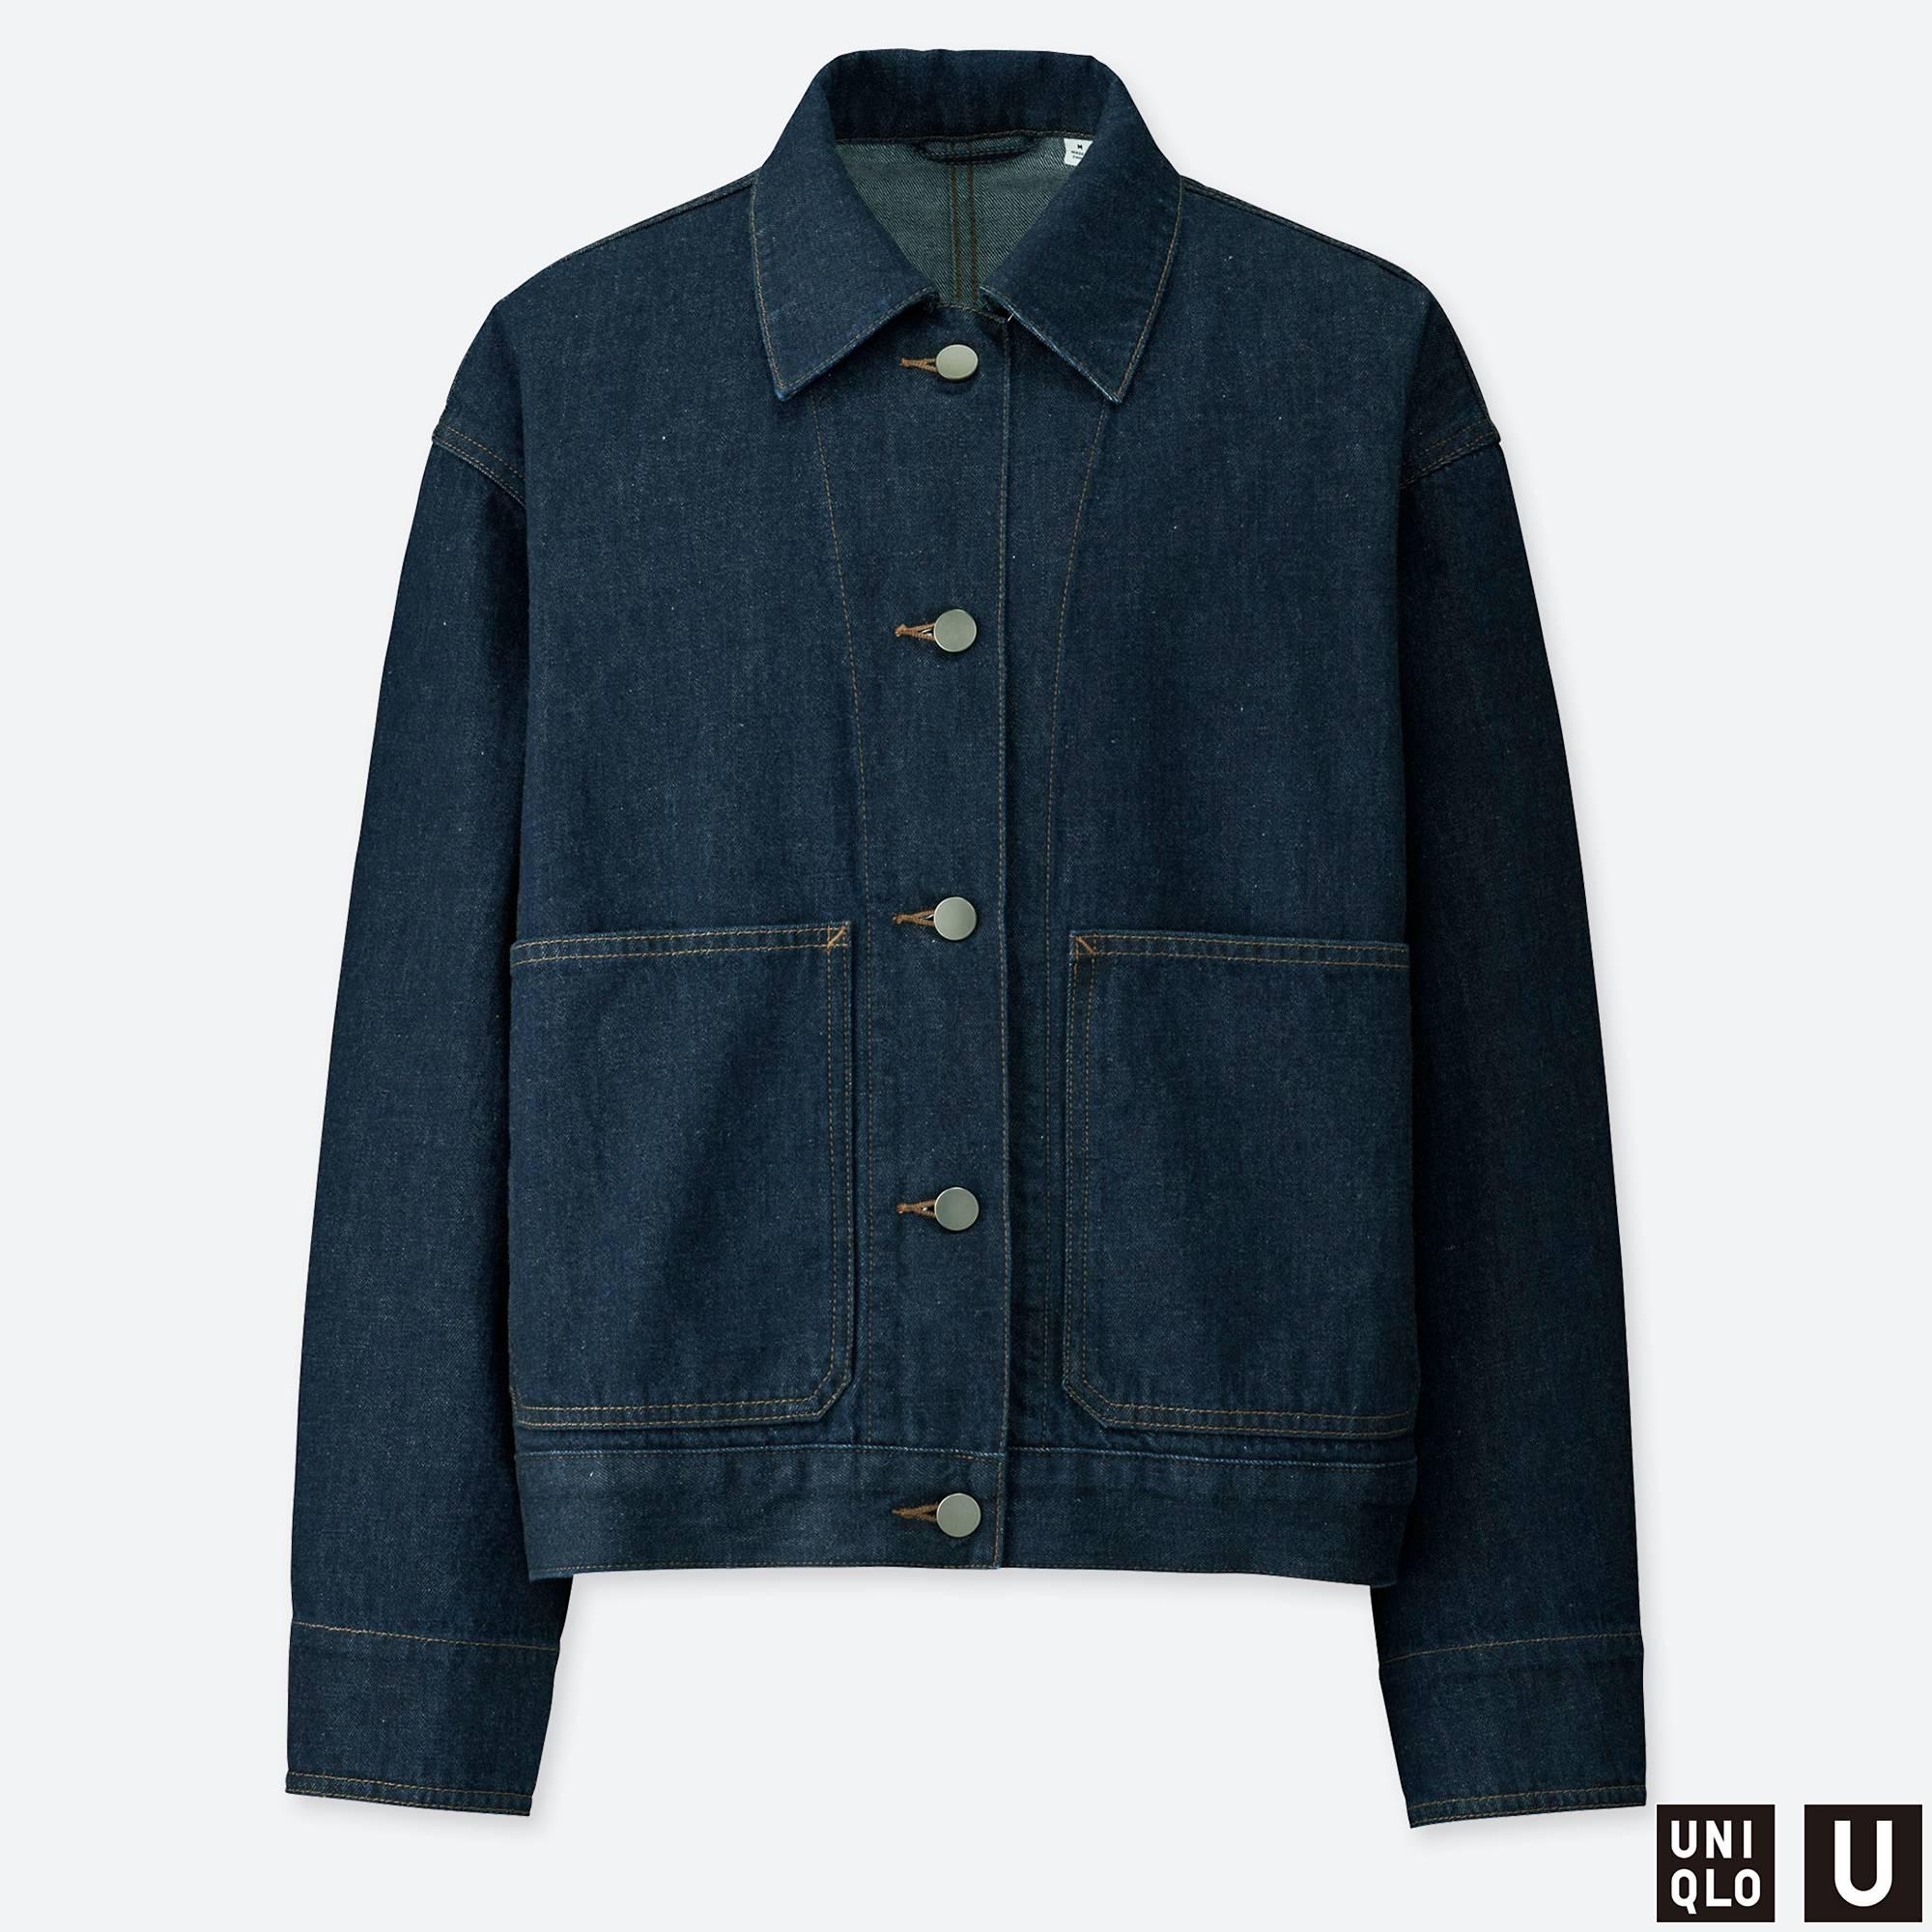 637465b68 Uniqlo U + Denim Jacket